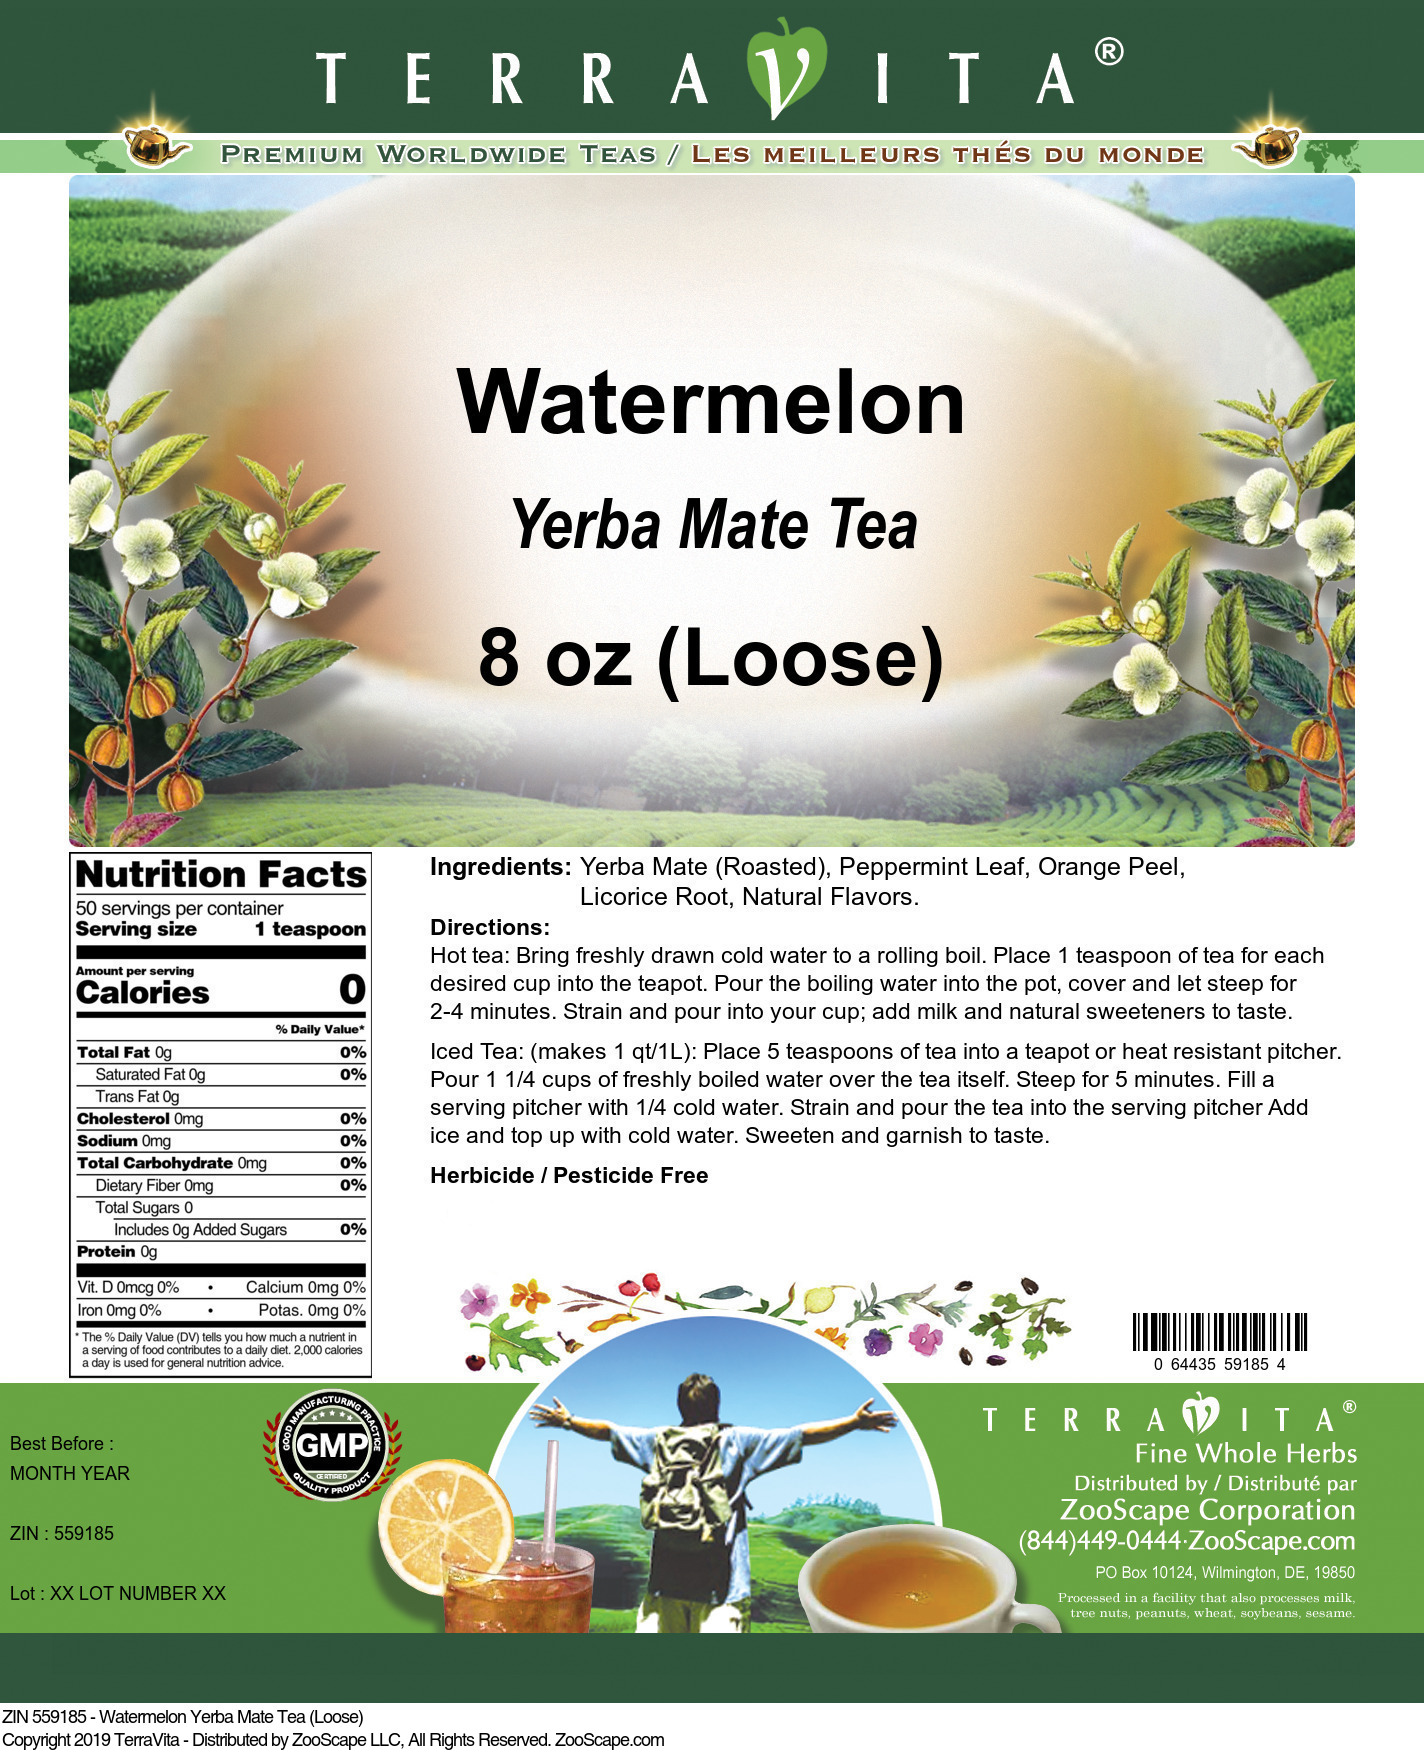 Watermelon Yerba Mate Tea (Loose)